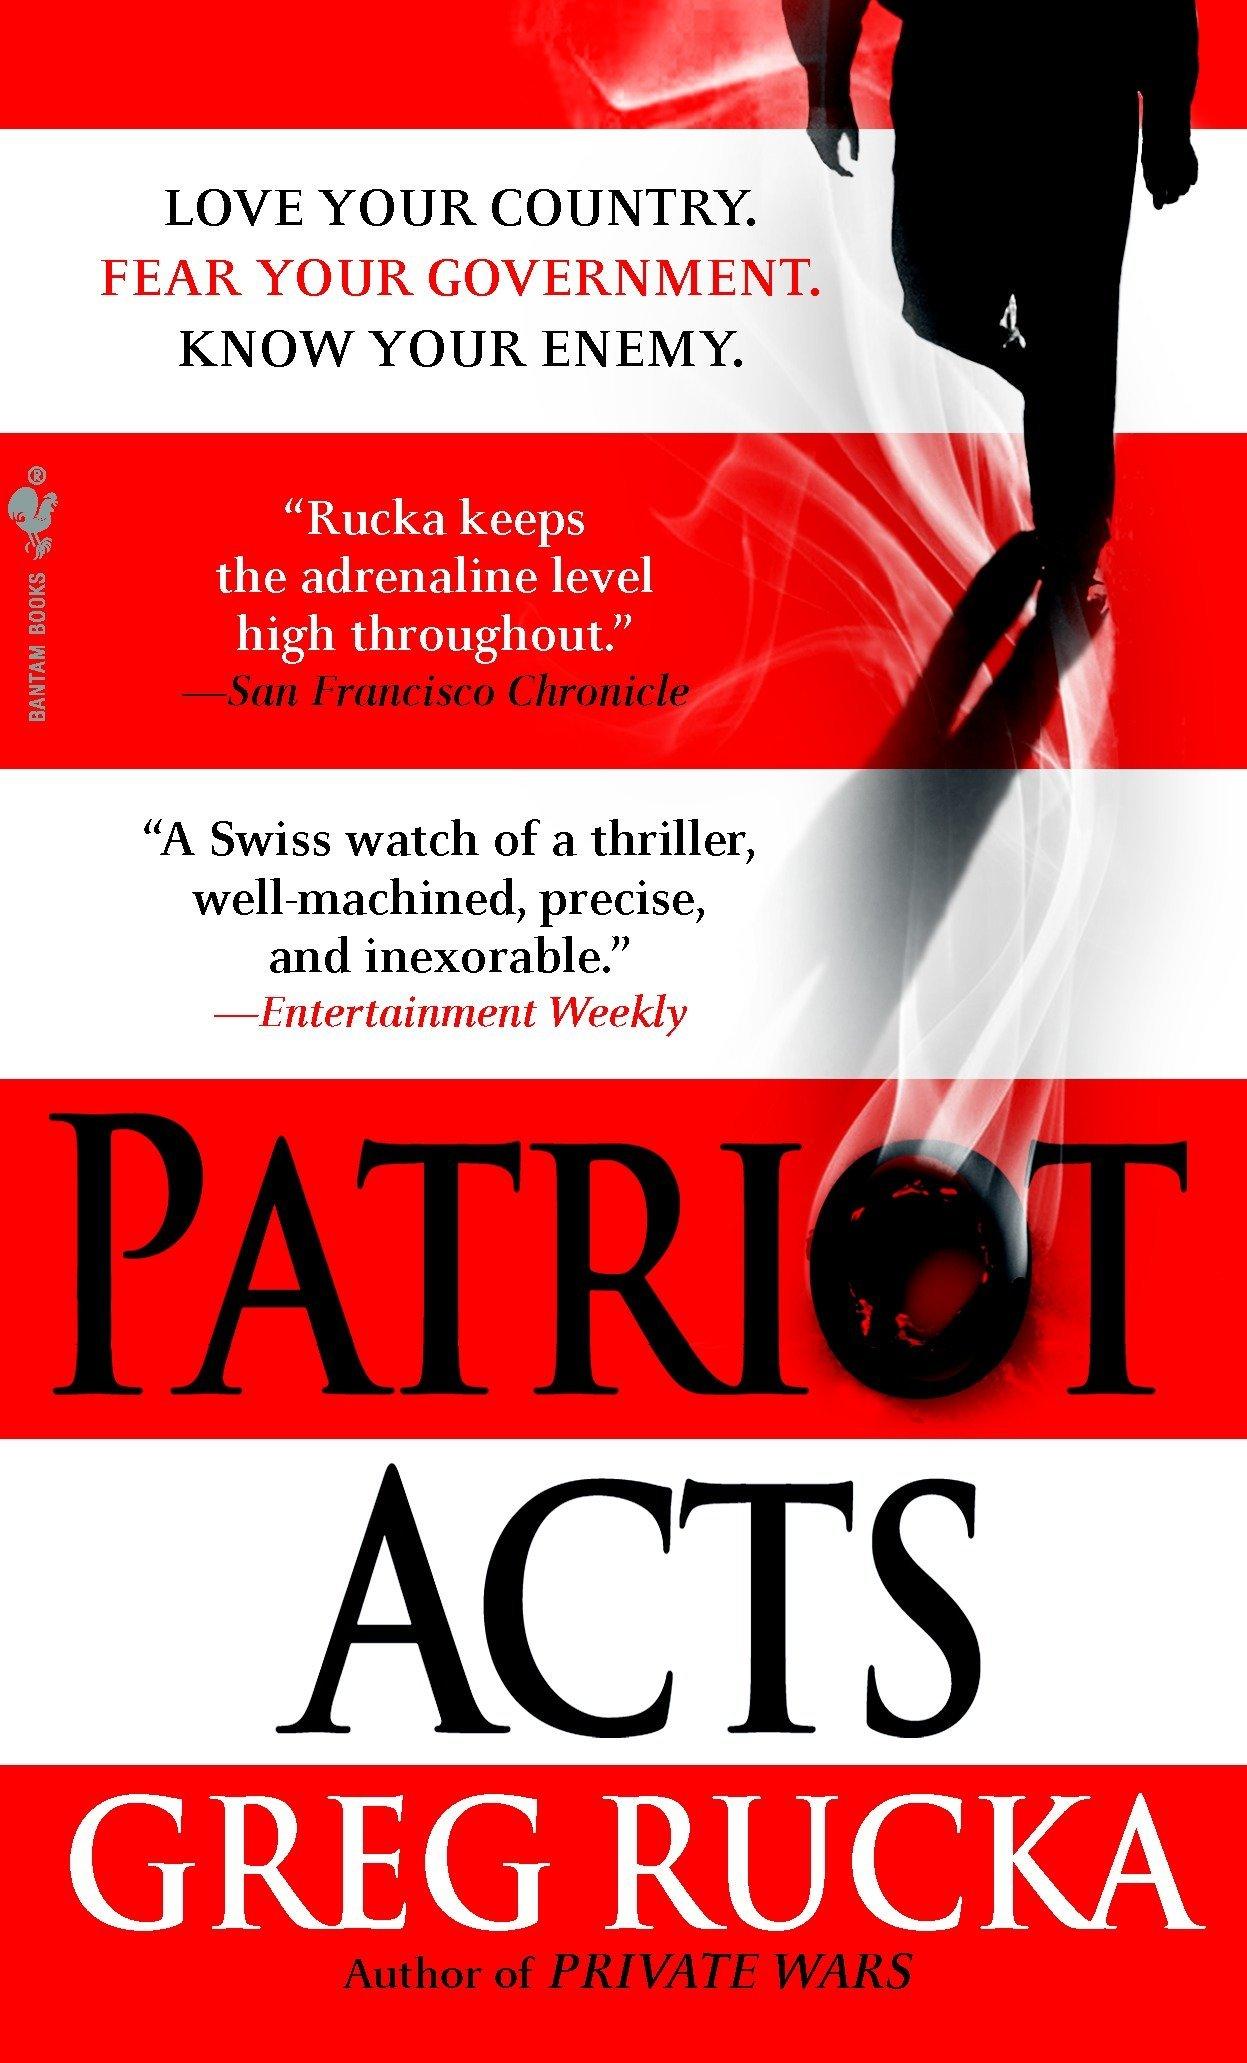 Patriot Acts (Atticus Kodiak): Greg Rucka: 9780553588996: Amazon.com: Books